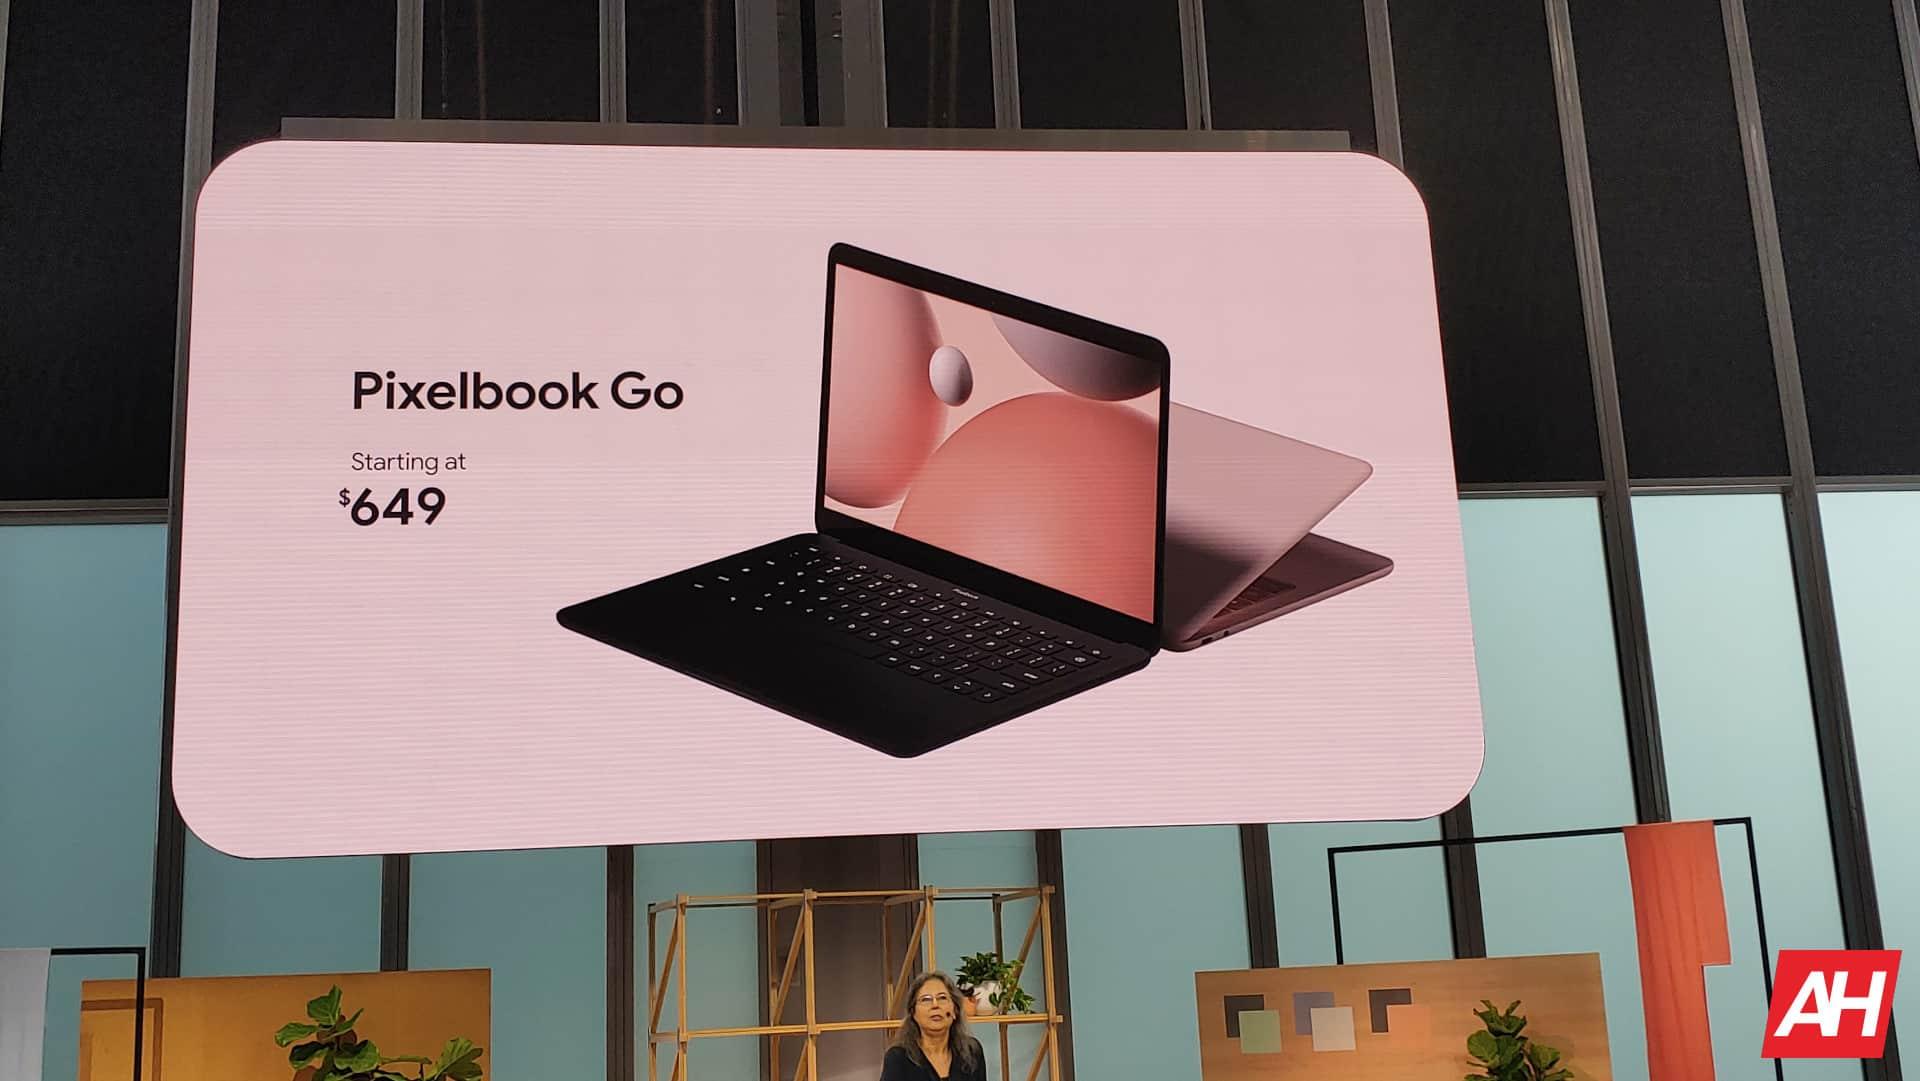 Google Event Pixelbook Go 6